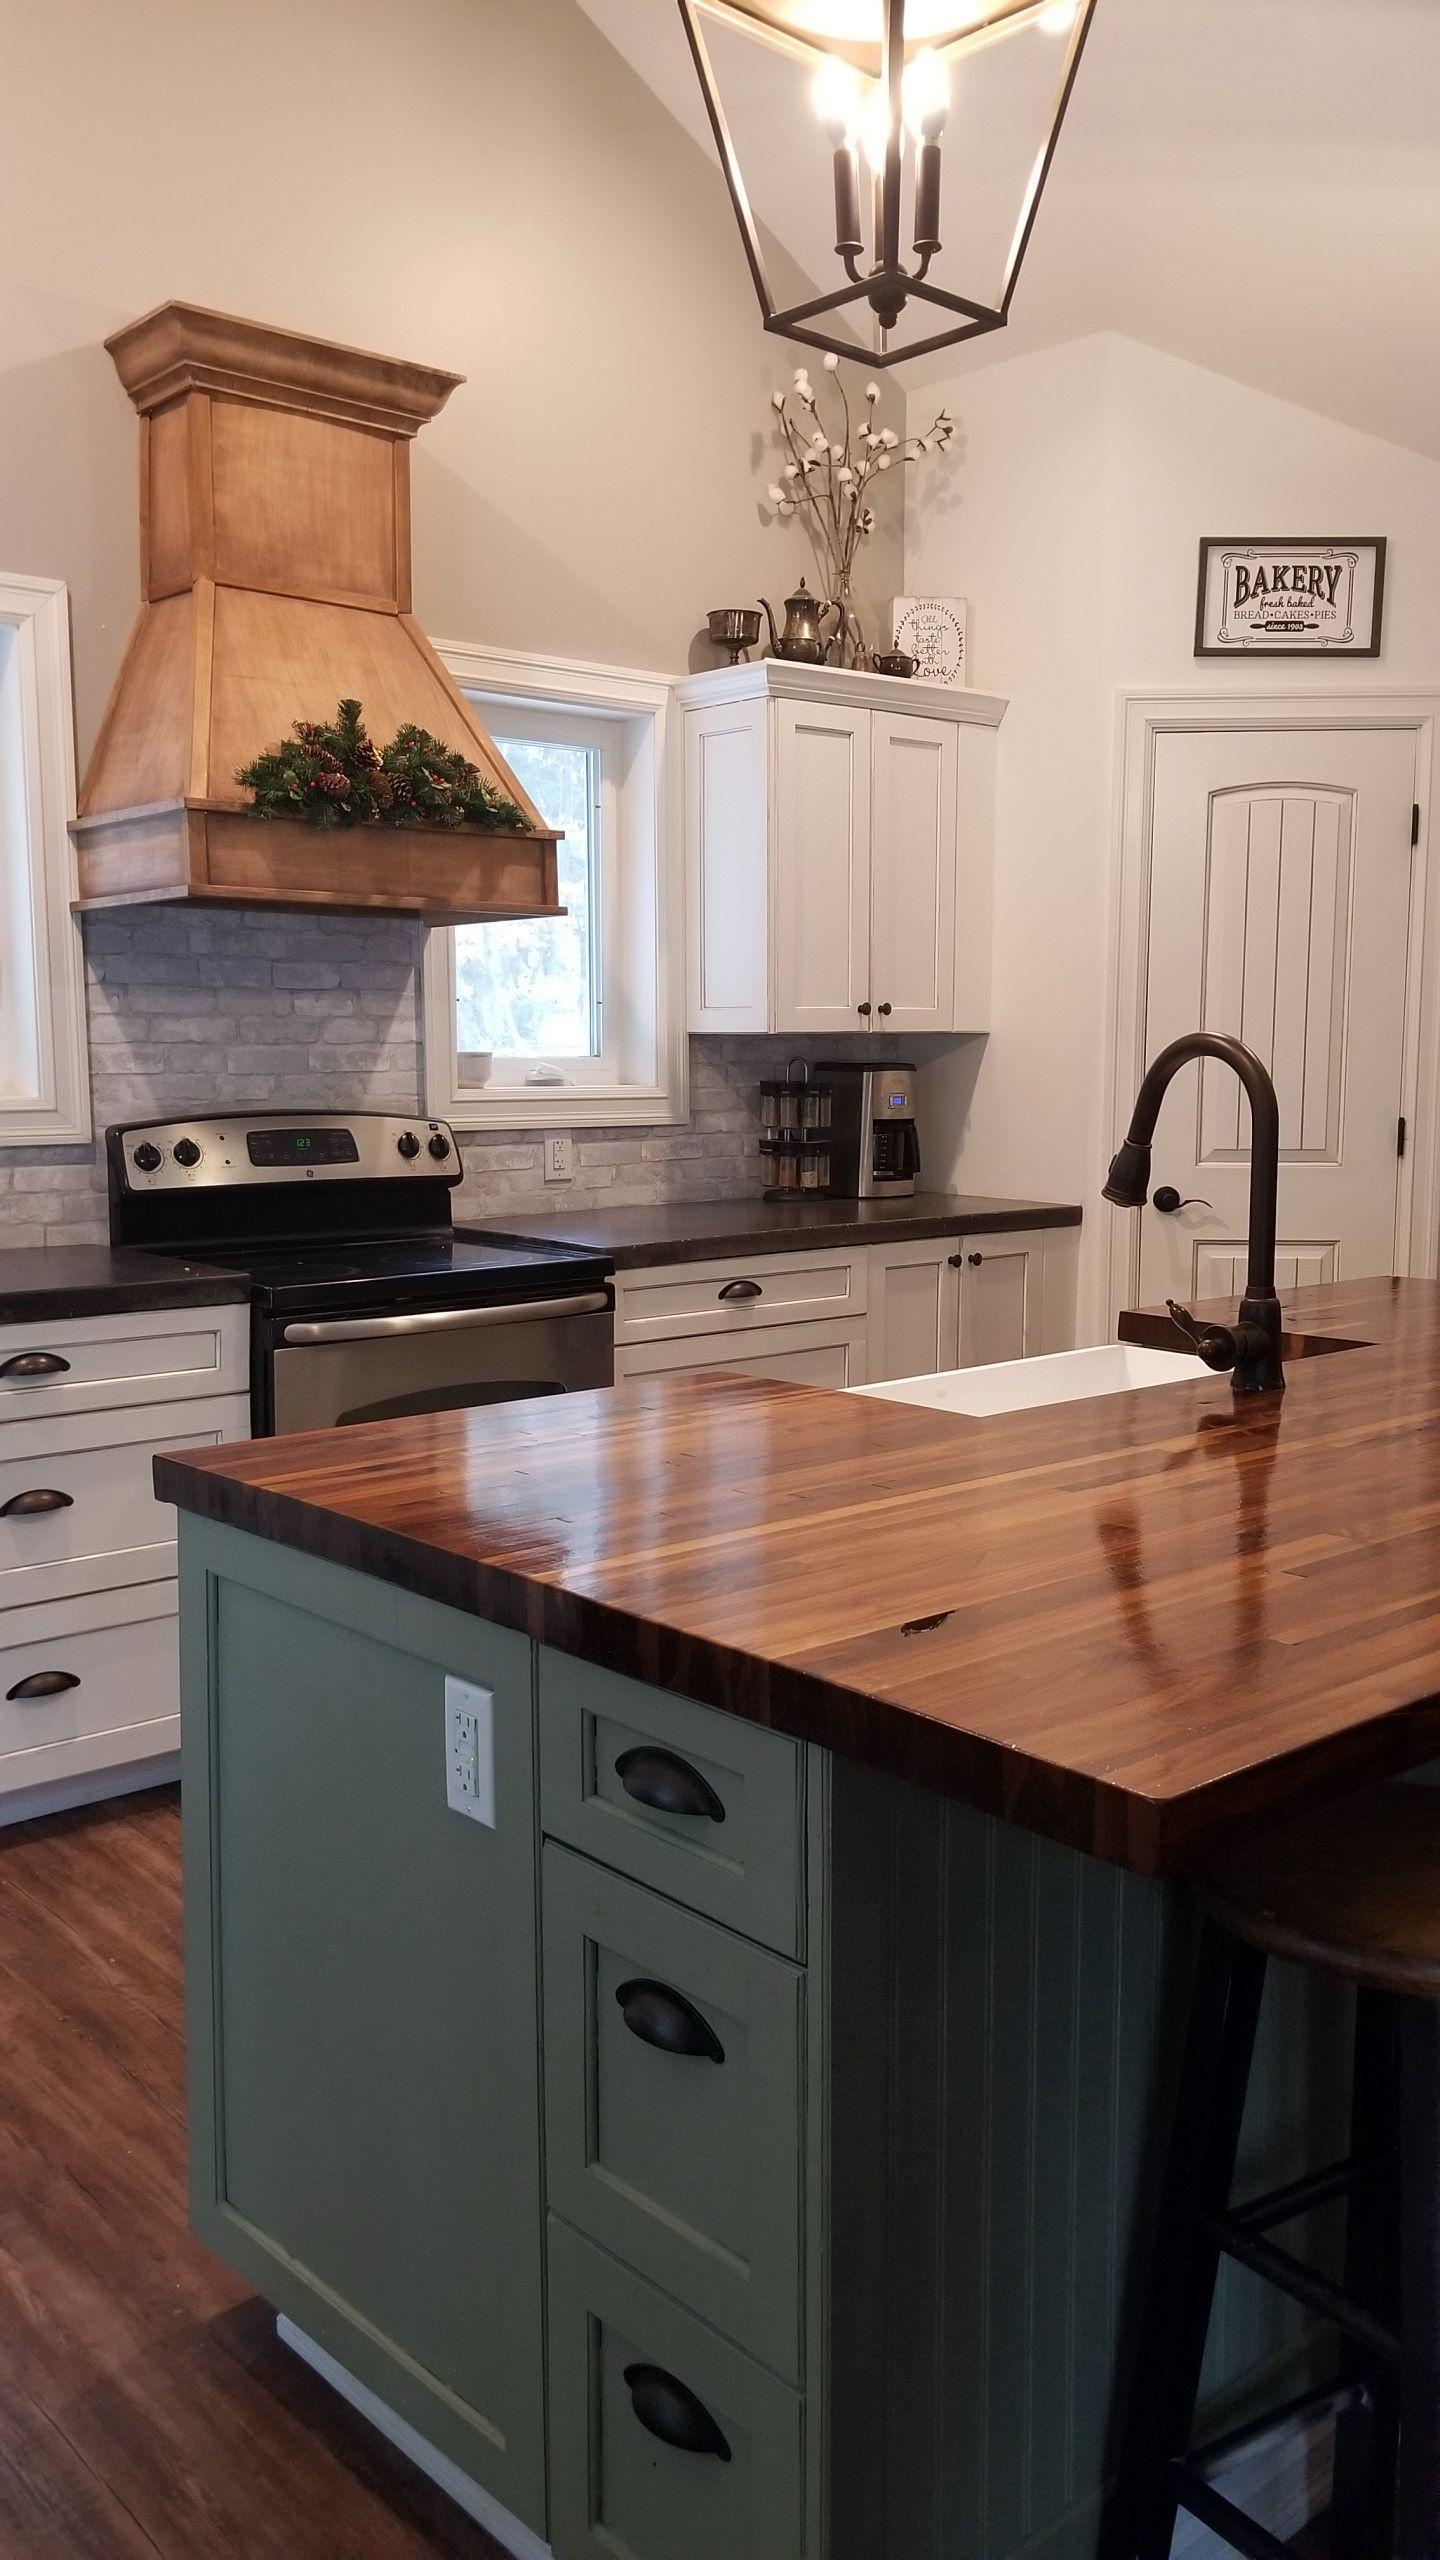 Diy Farmhouse Kitchen Build Your Own Kitchen The Homemade